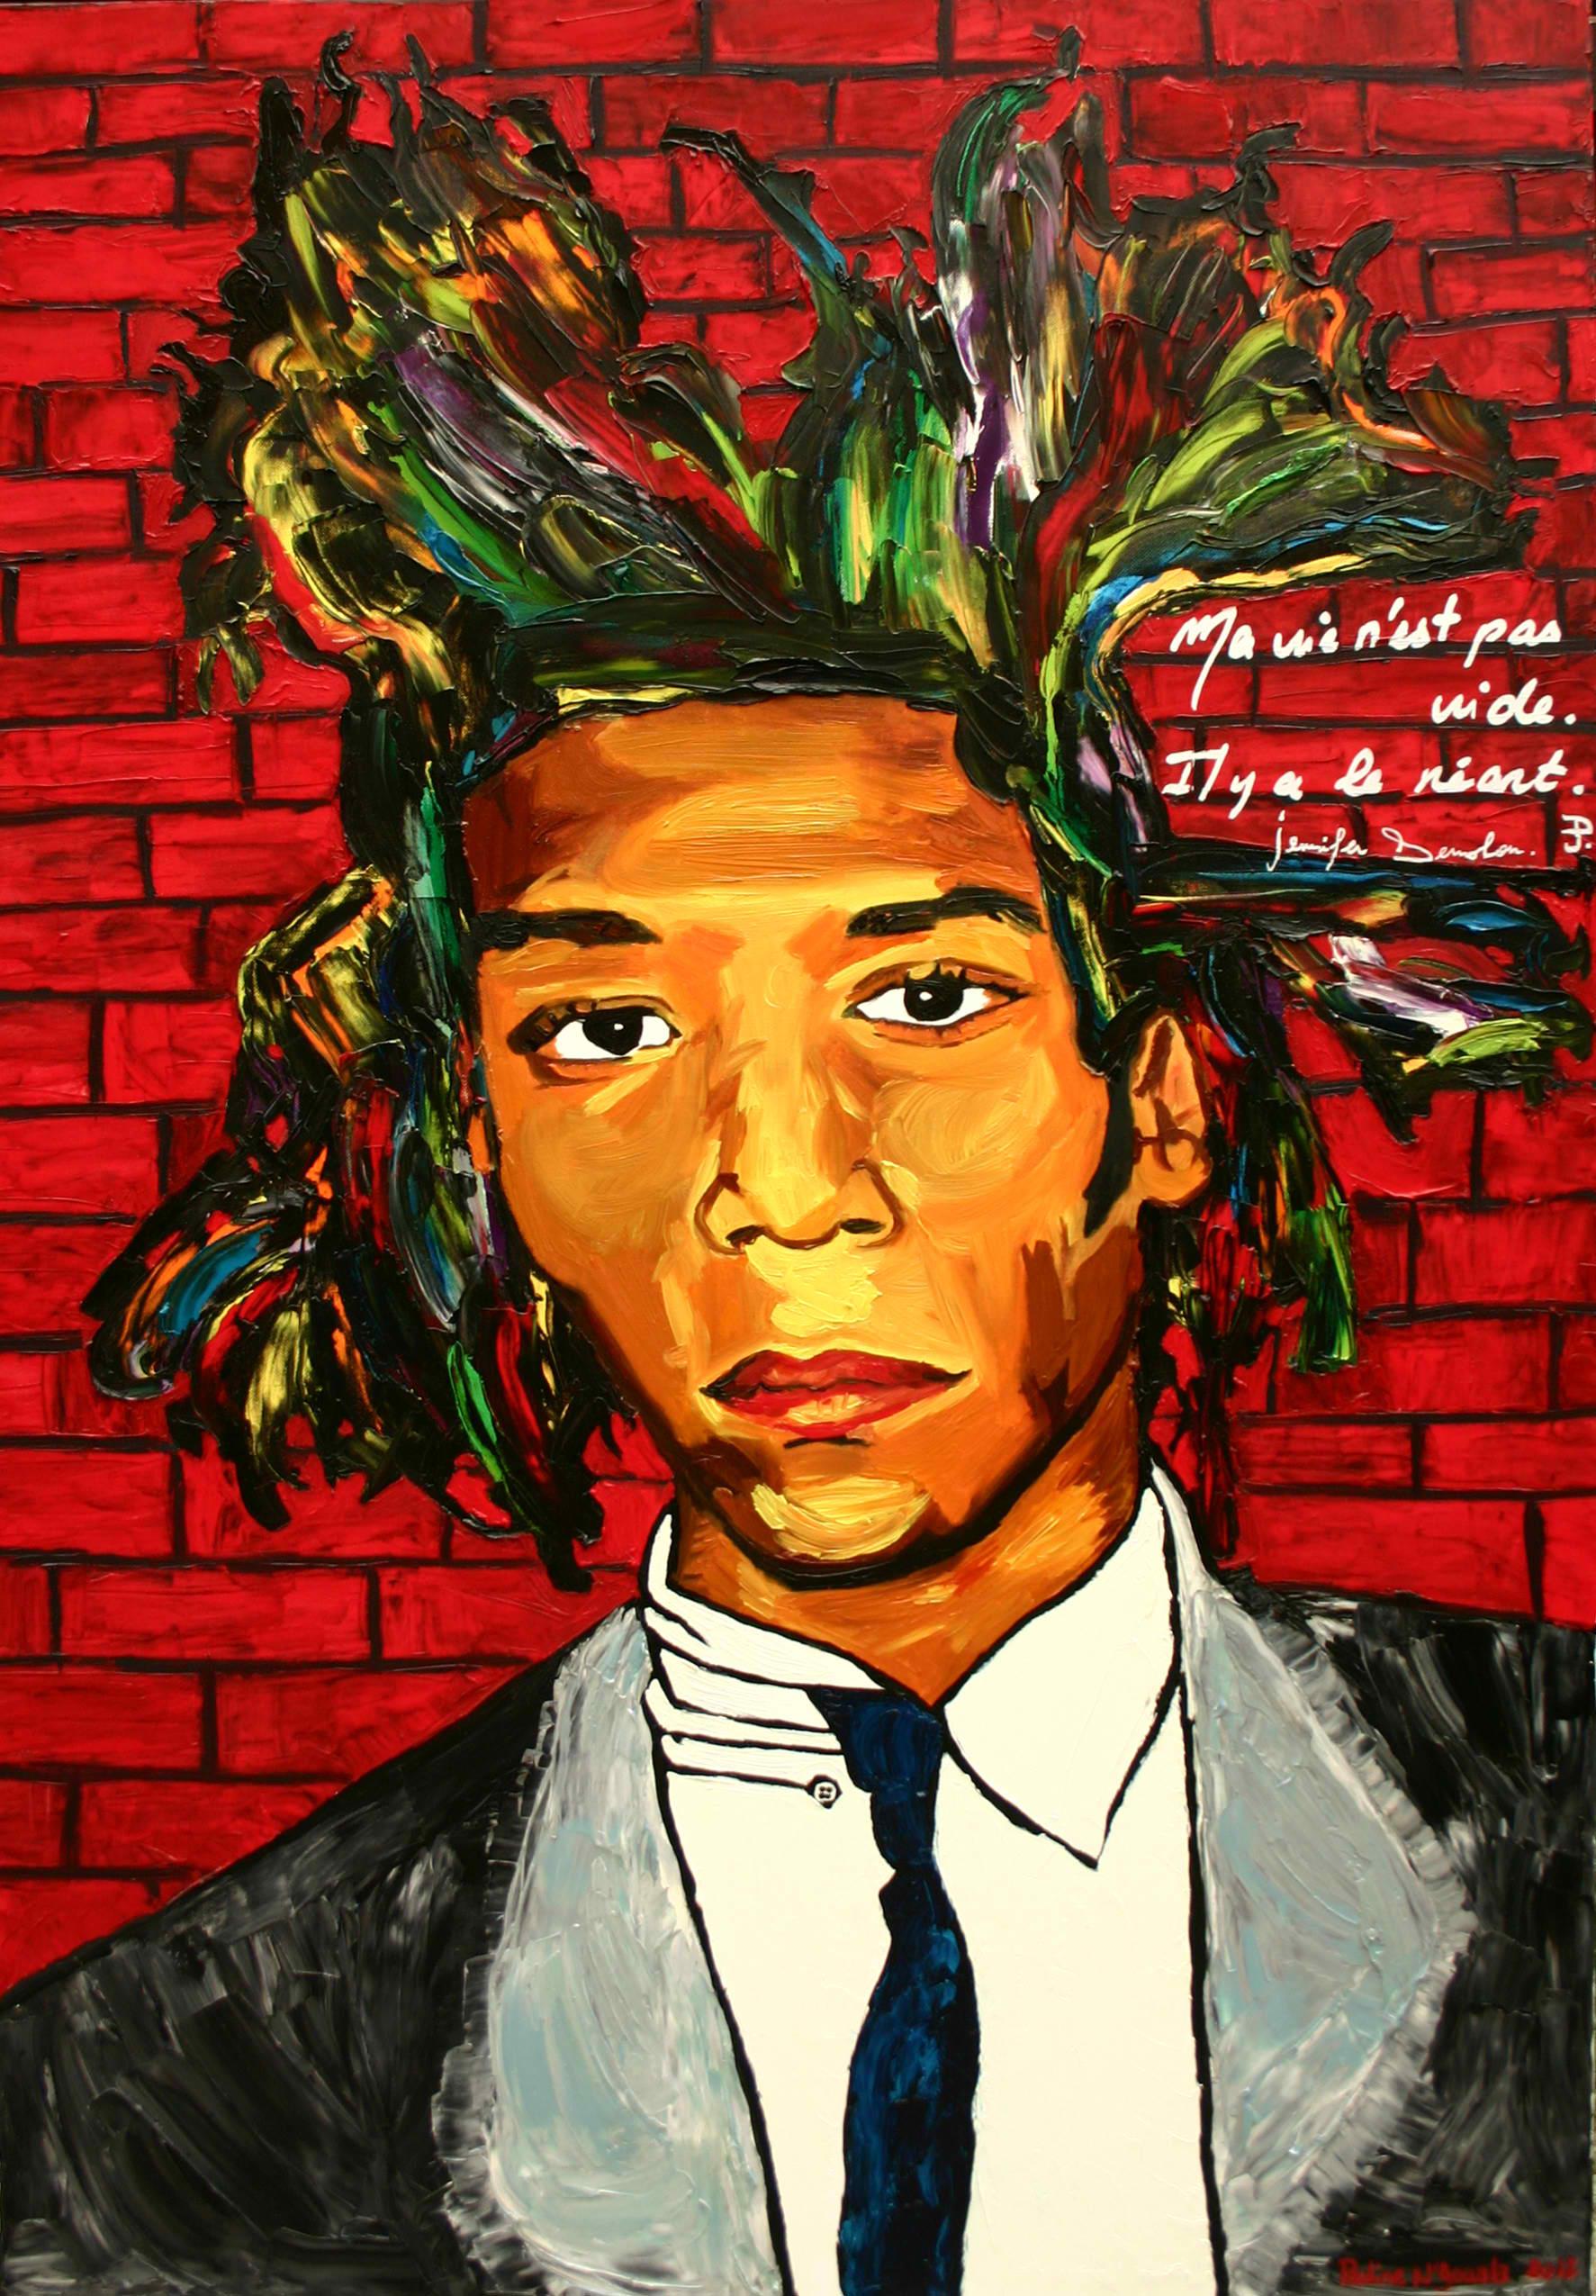 2013 Oct. 25: Black Lesbian French artist paints Mandela | inkanyiso.org